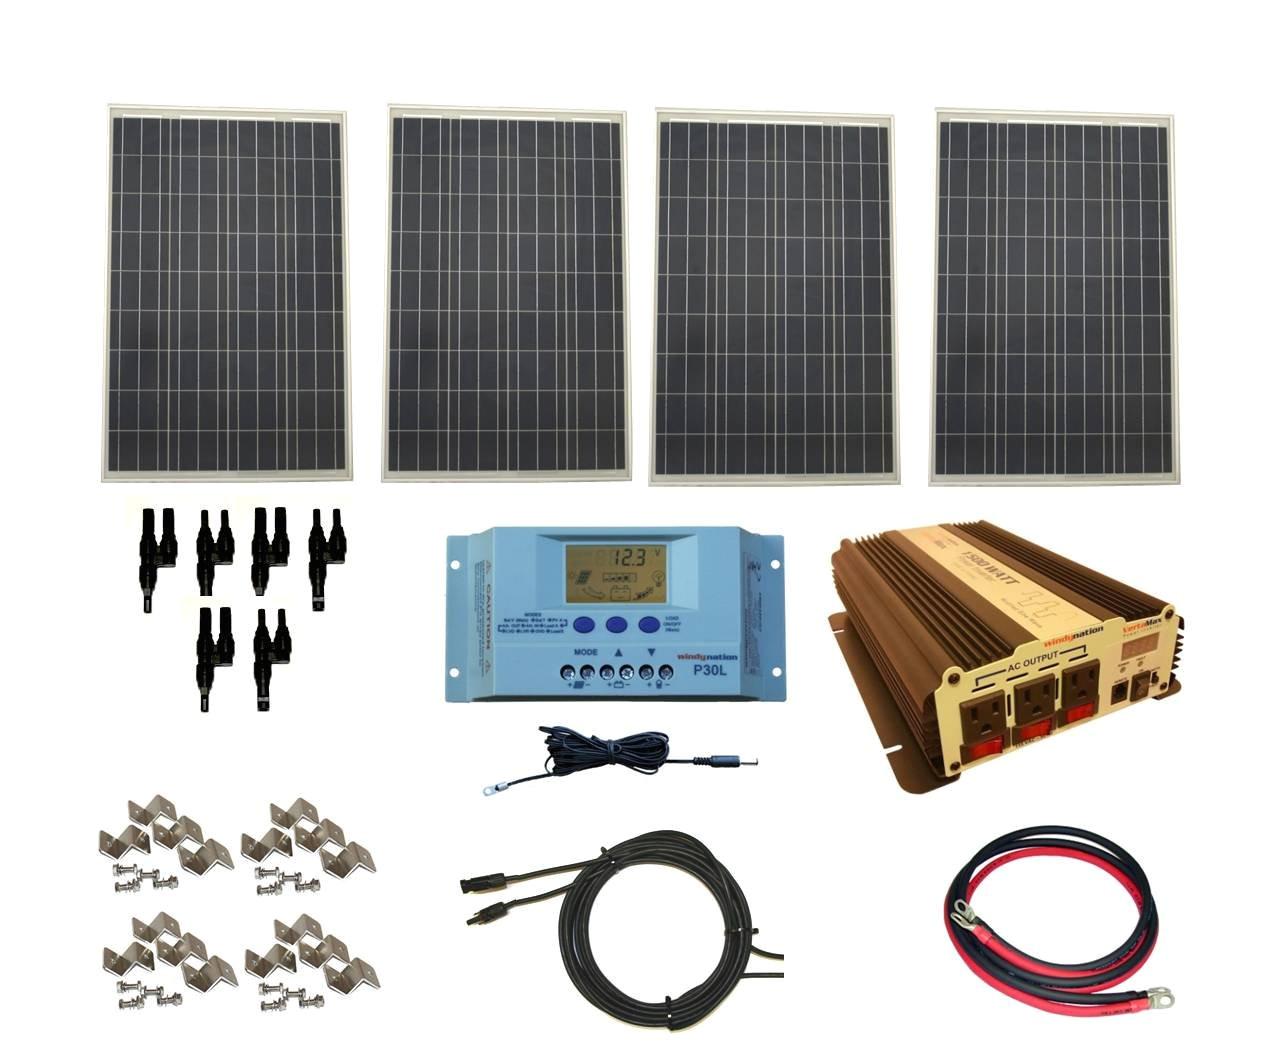 amazon com windynation complete 400 watt solar panel kit with 1500 watt vertamax power inverter rv boat off grid 12 volt battery garden outdoor